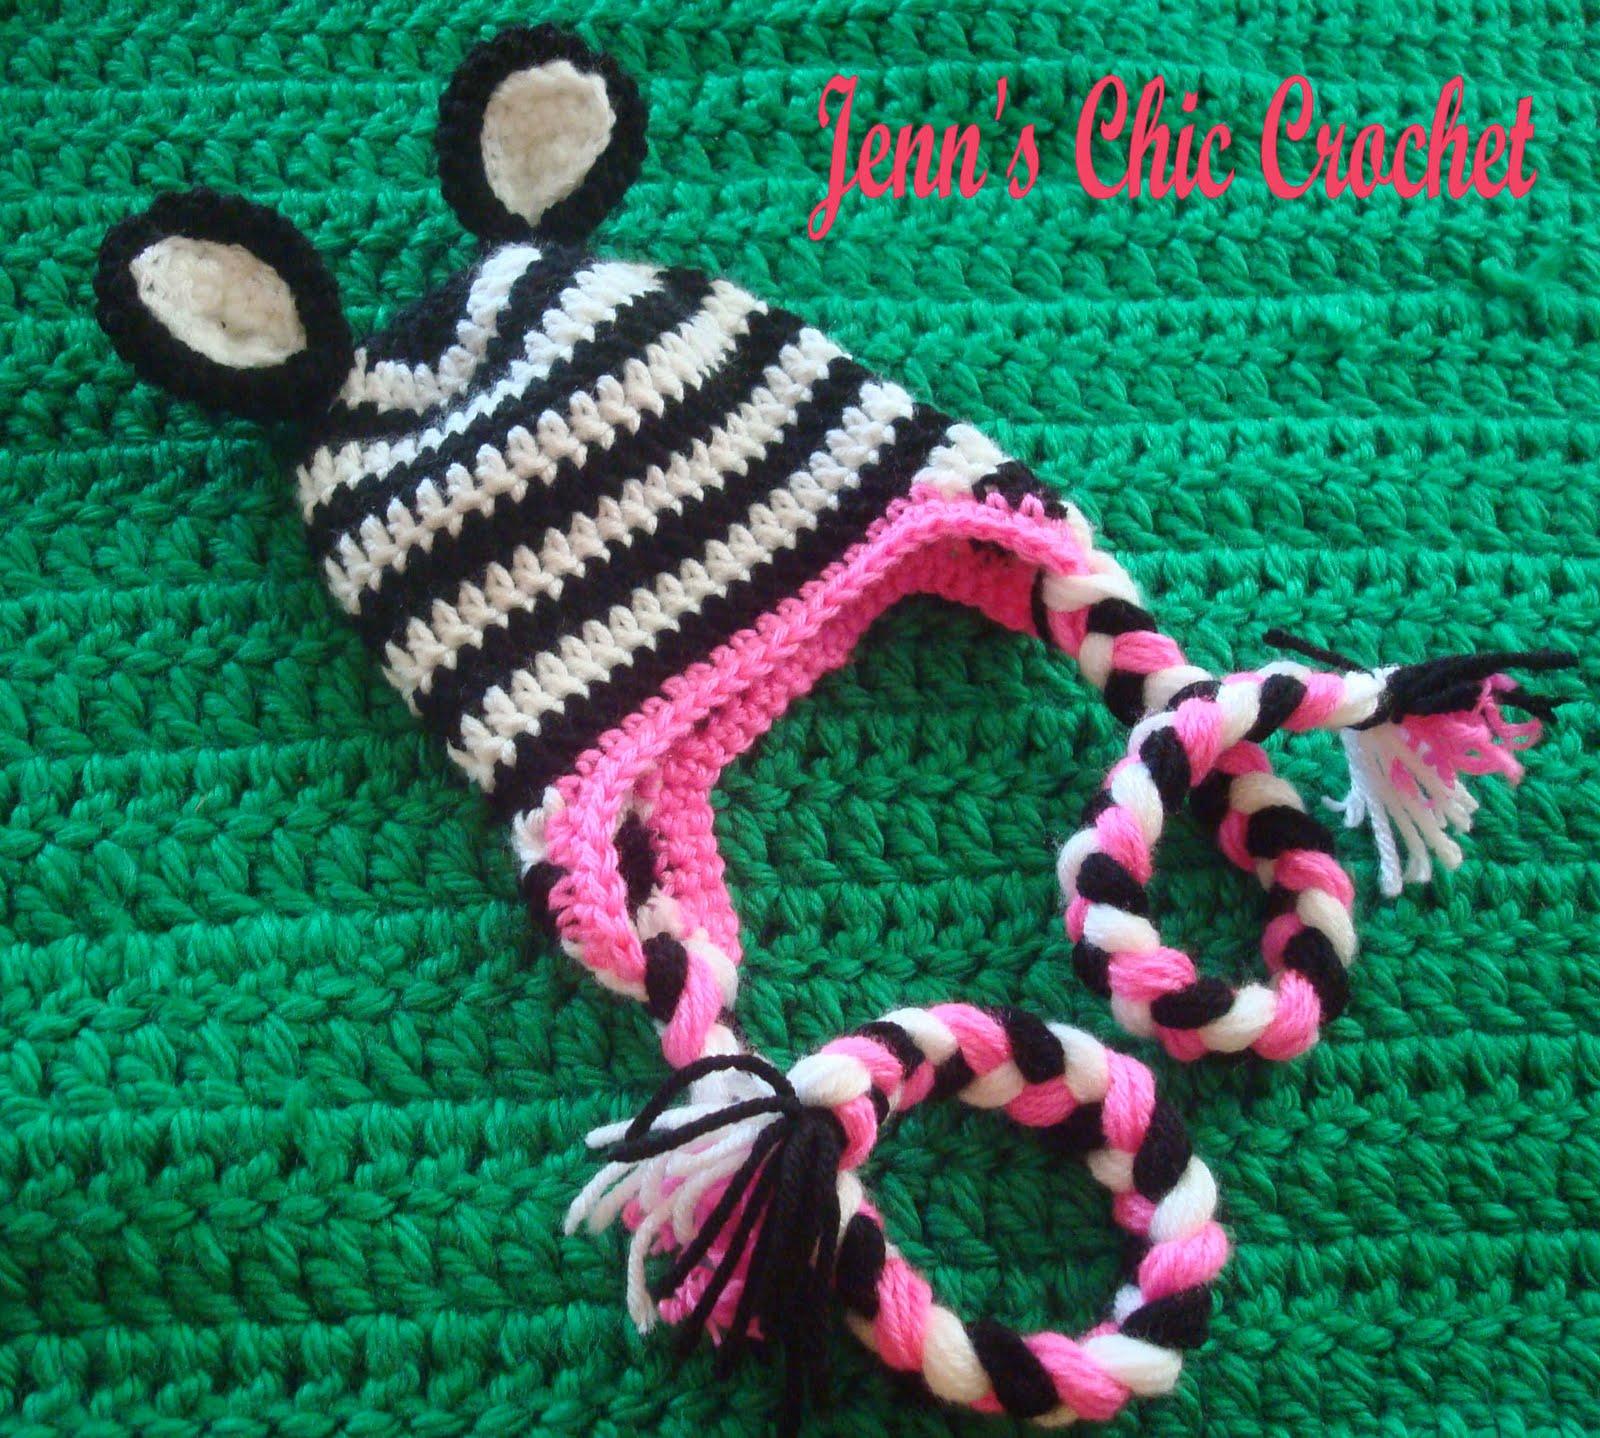 Jenns Chic Crochet: Zebra Hat